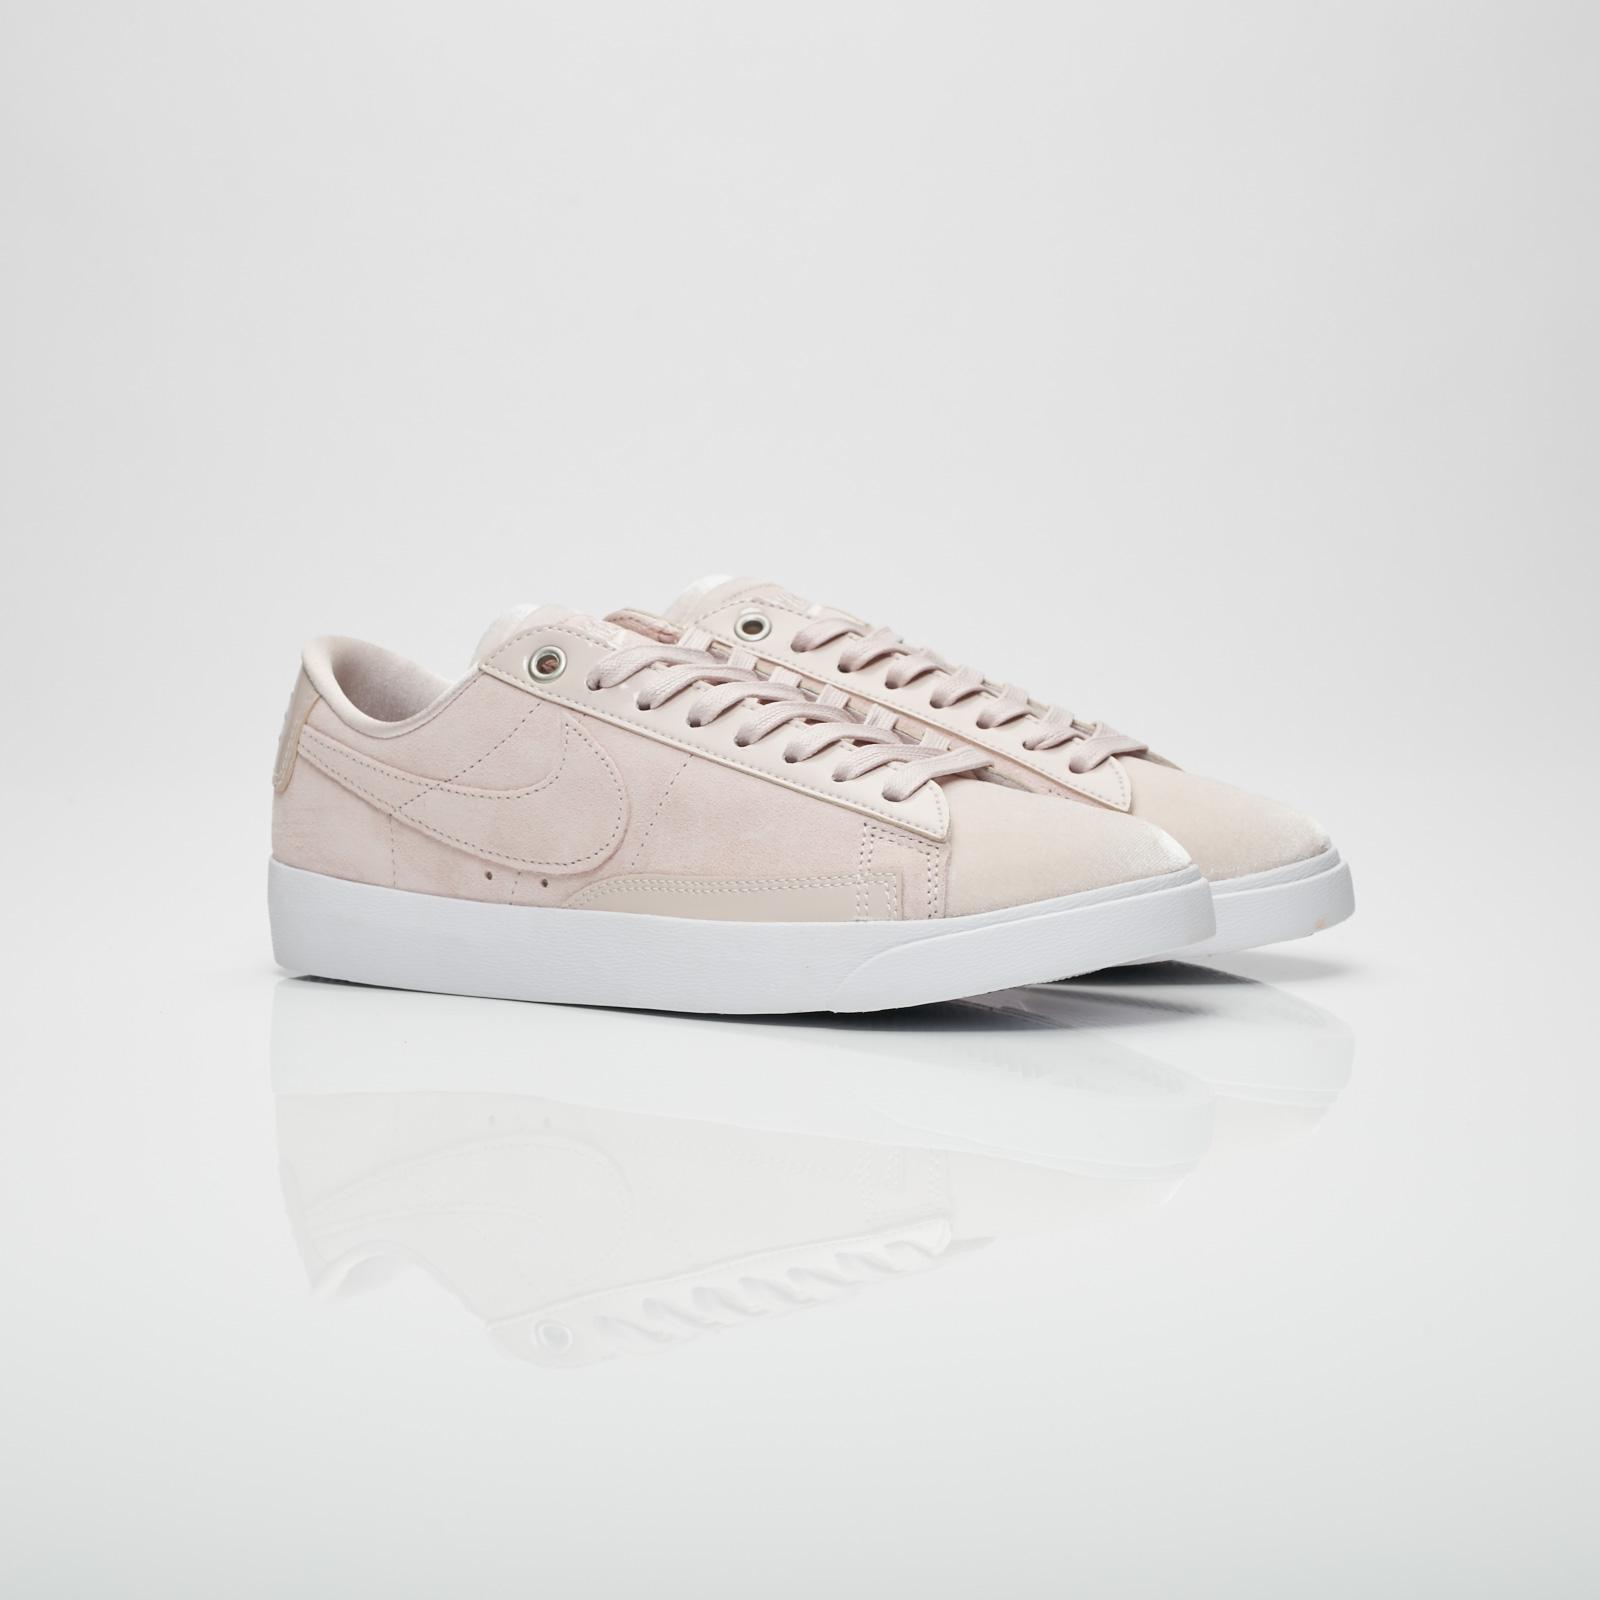 reputable site 50f9c 6a0f7 Nike Sportswear Wmns Blazer Low LX